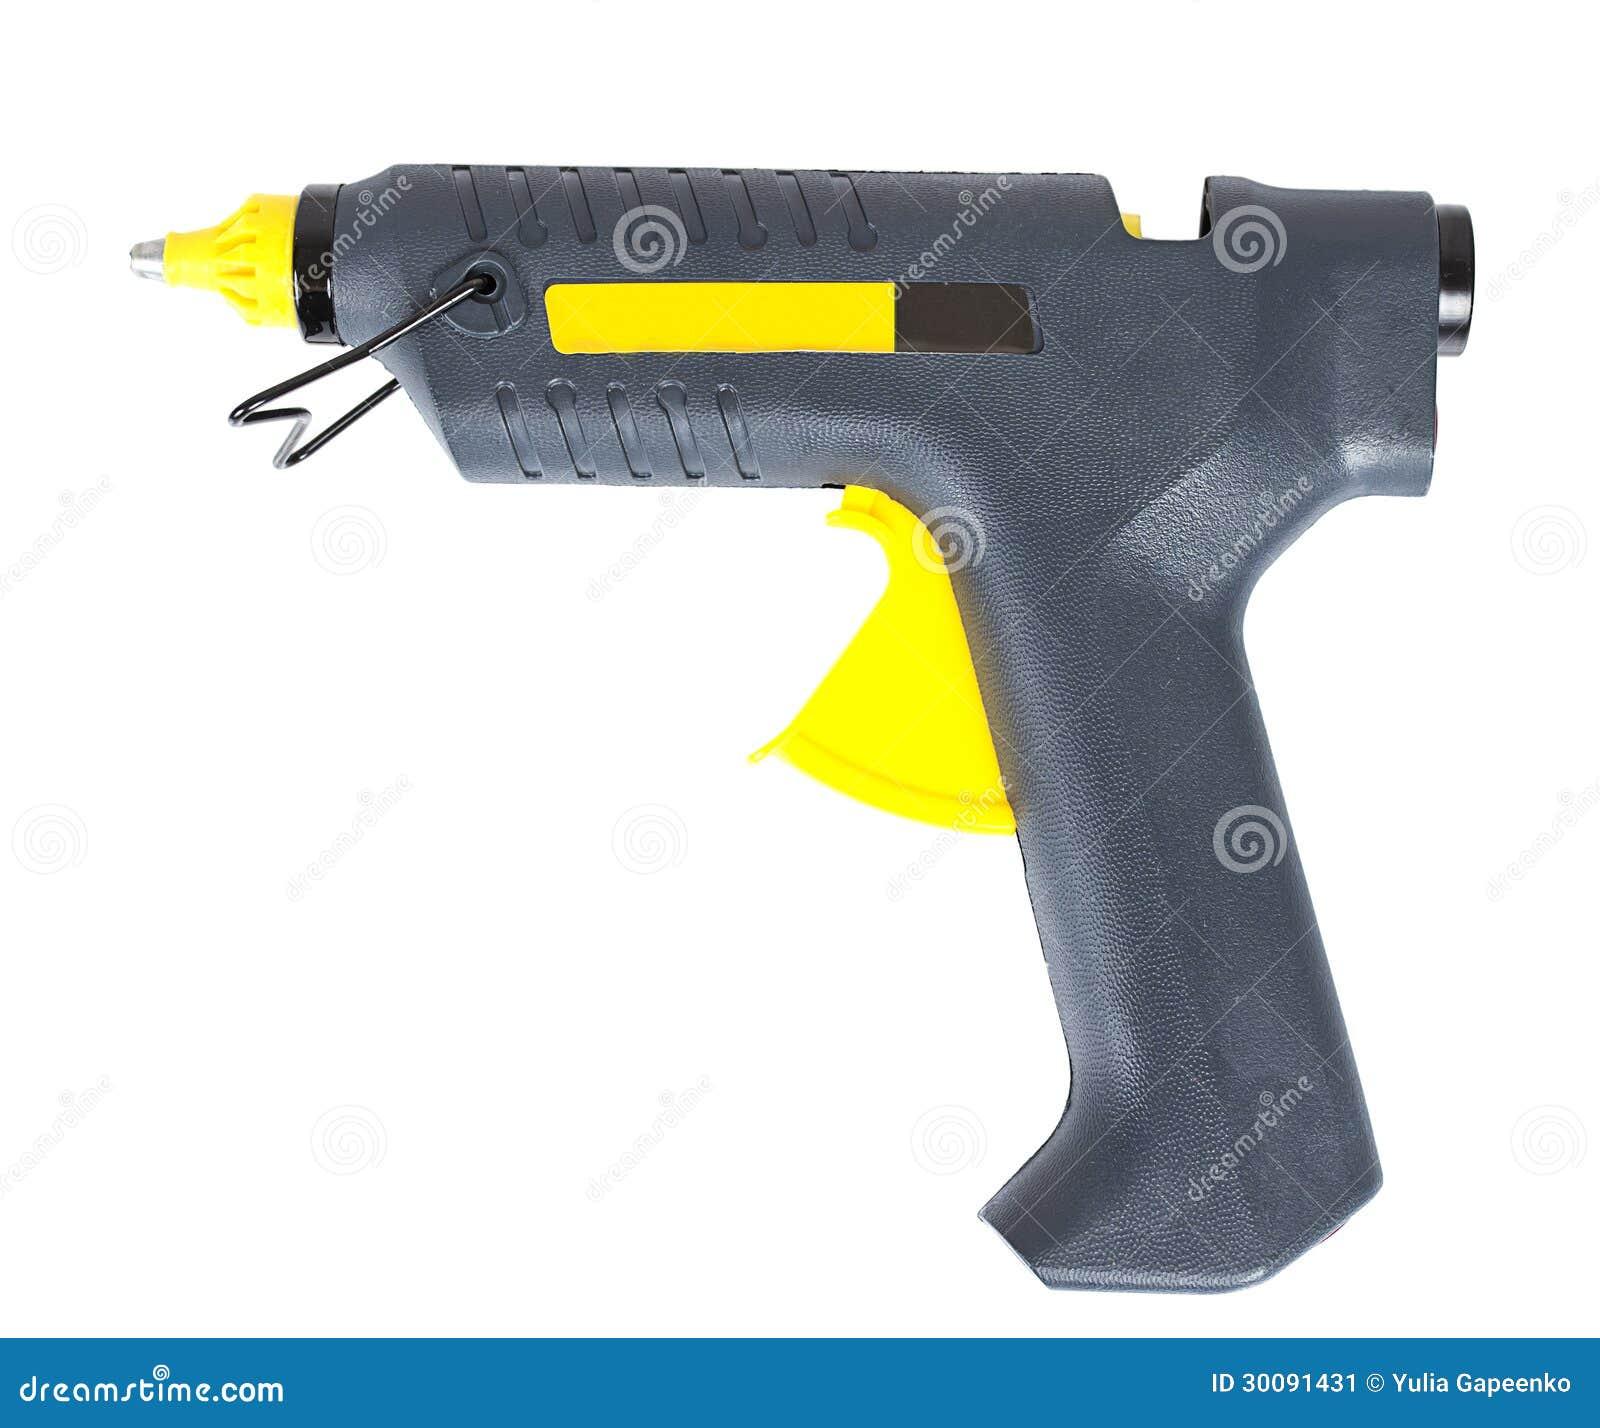 how to buy a hot glue gun